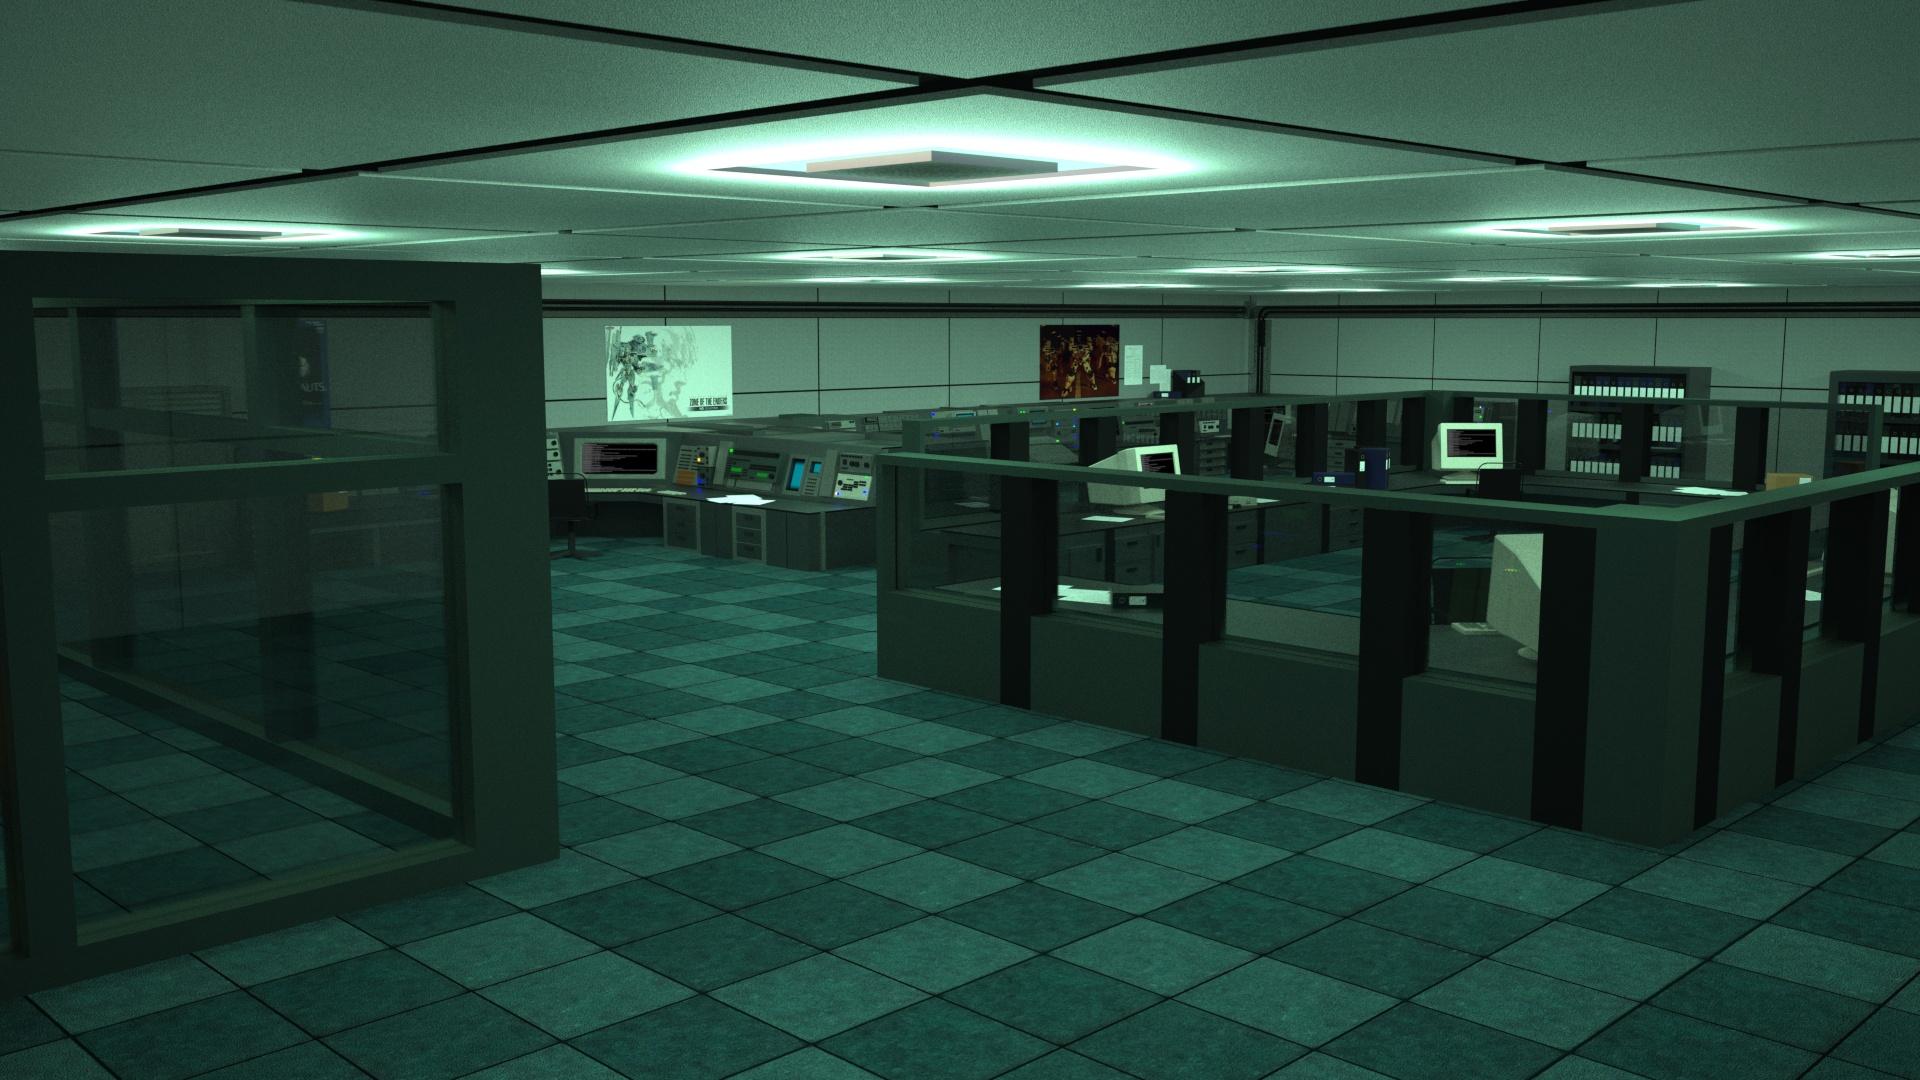 mgs-b2-computerroom